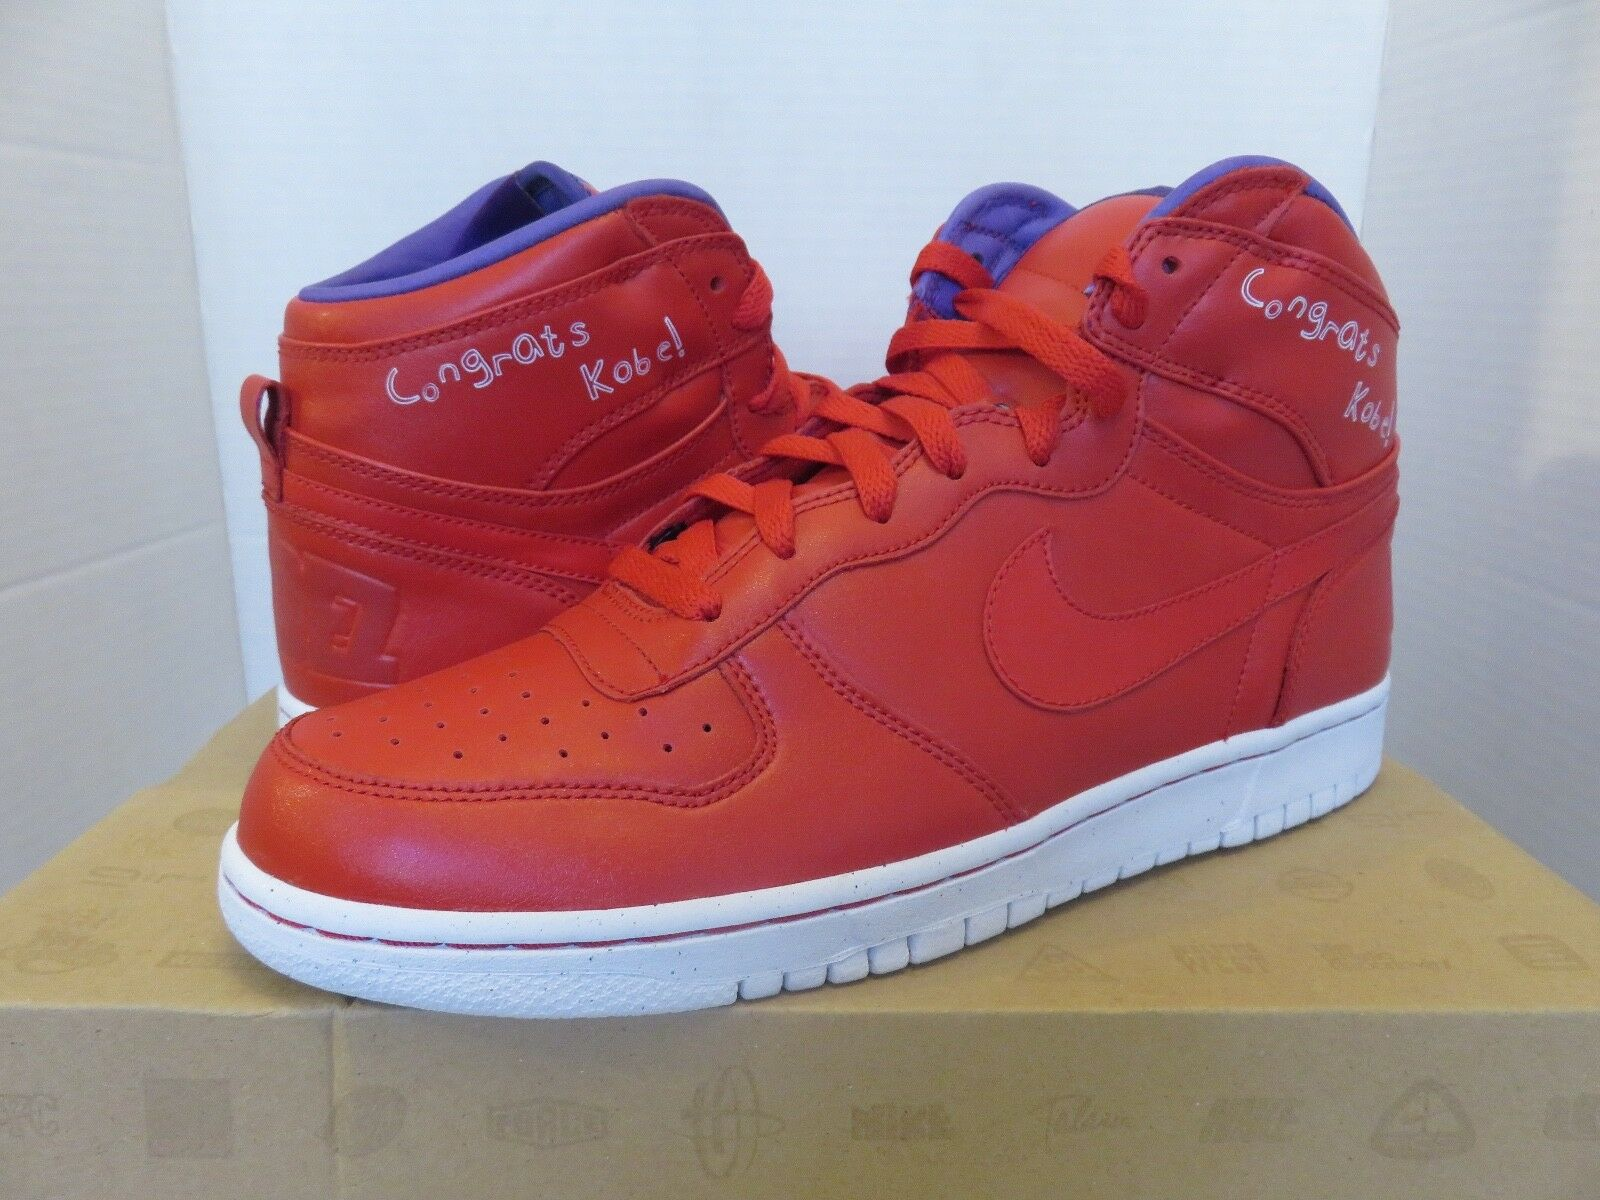 BIG NIKE HIGH QK QS Kobe Dunk Lil Dez MVP Red/Purple Size 10 DS 370428 600